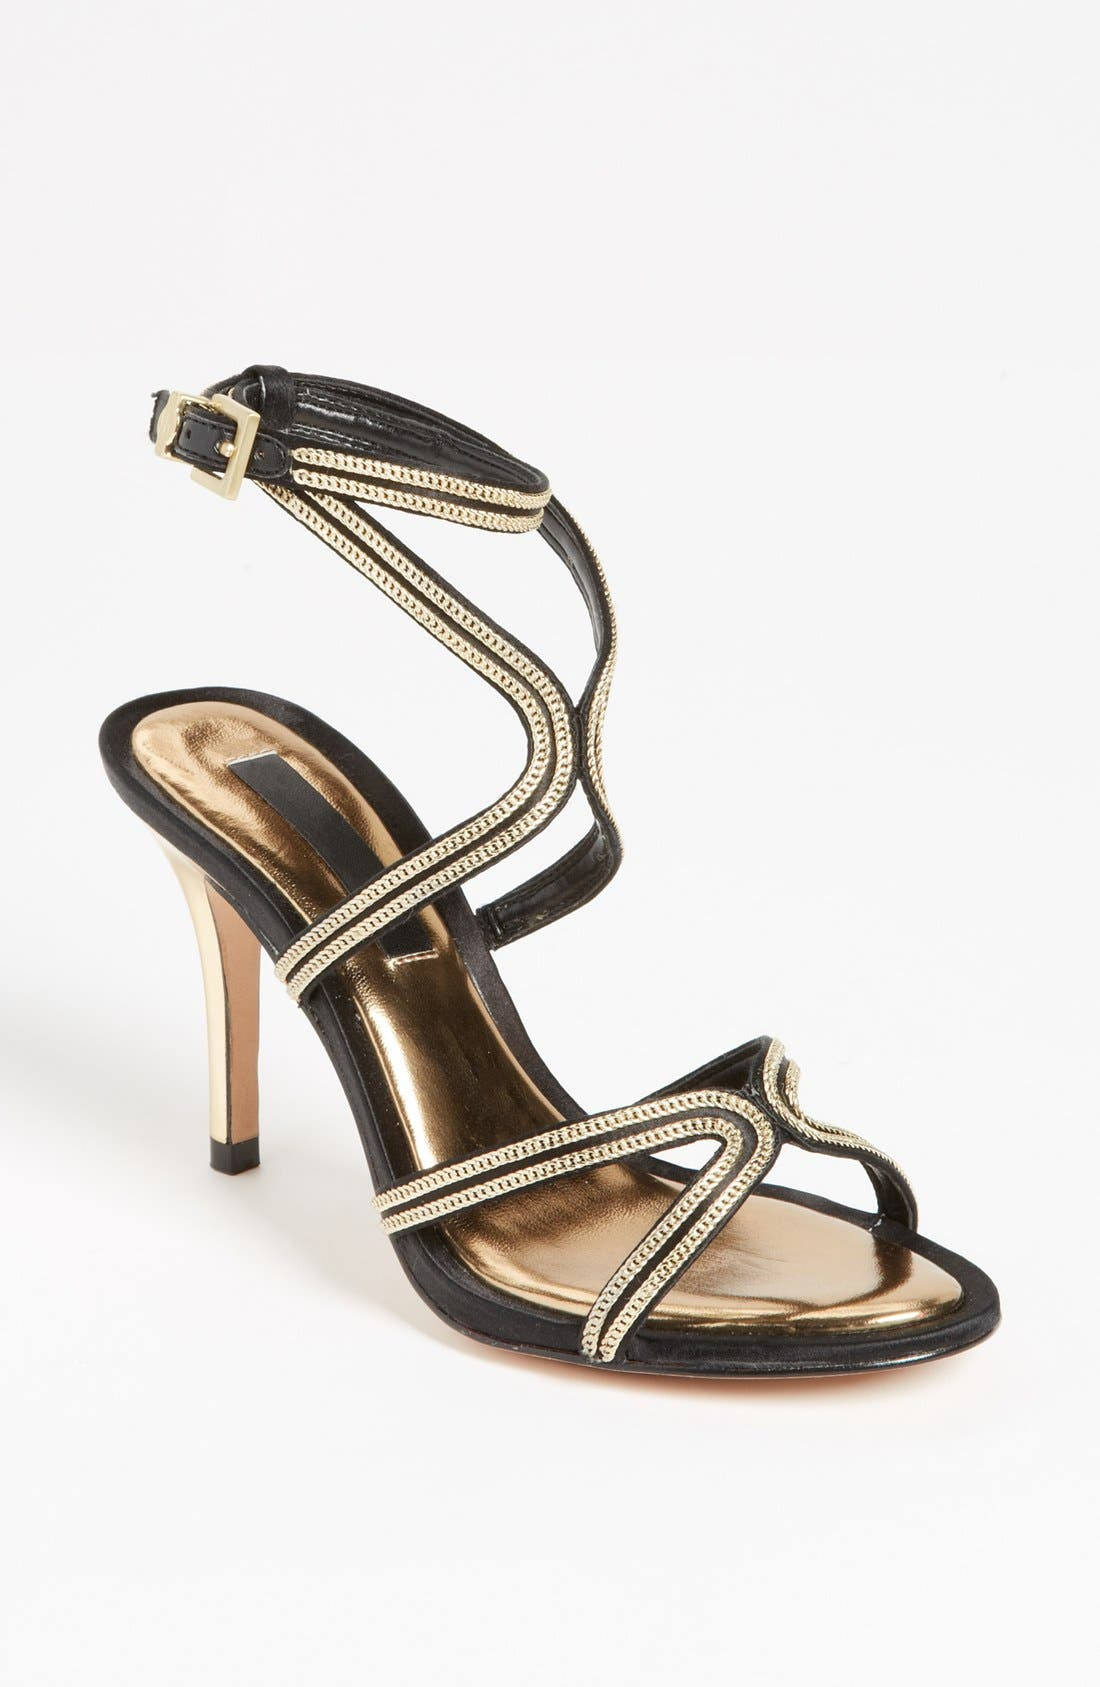 Main Image - BCBGMAXAZRIA 'Primp' Sandal